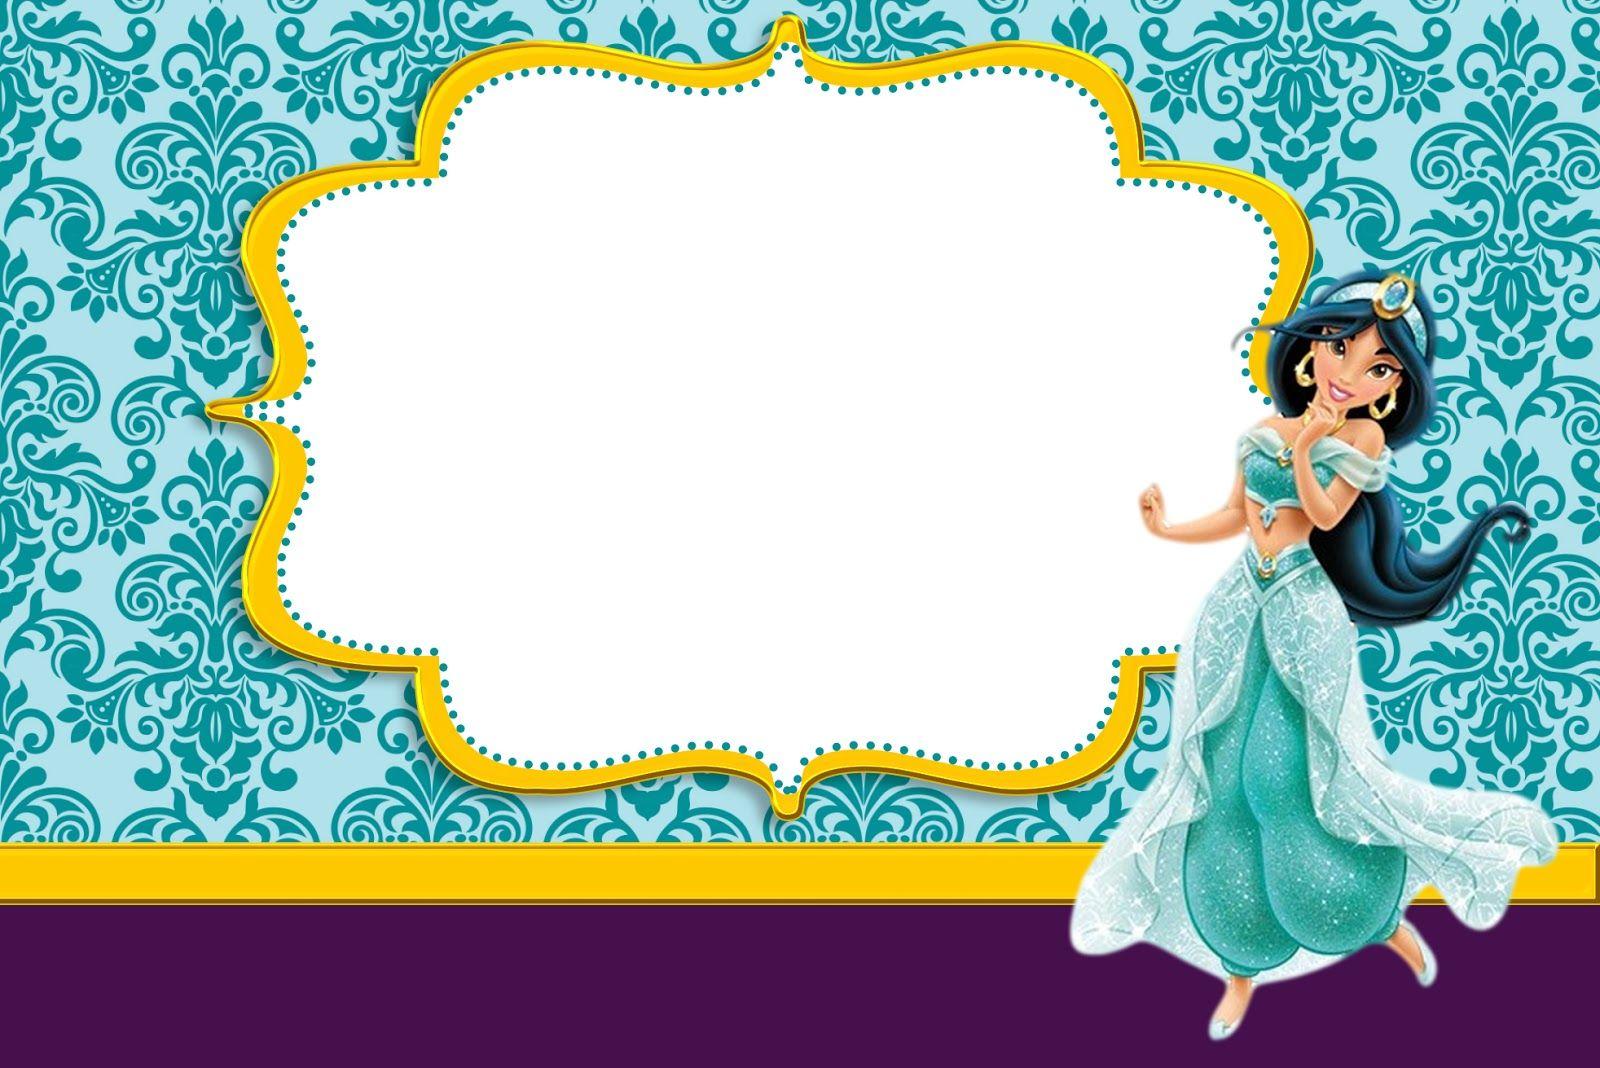 Disney Birthday Card Girl Parties Party Printables Invitation Templates